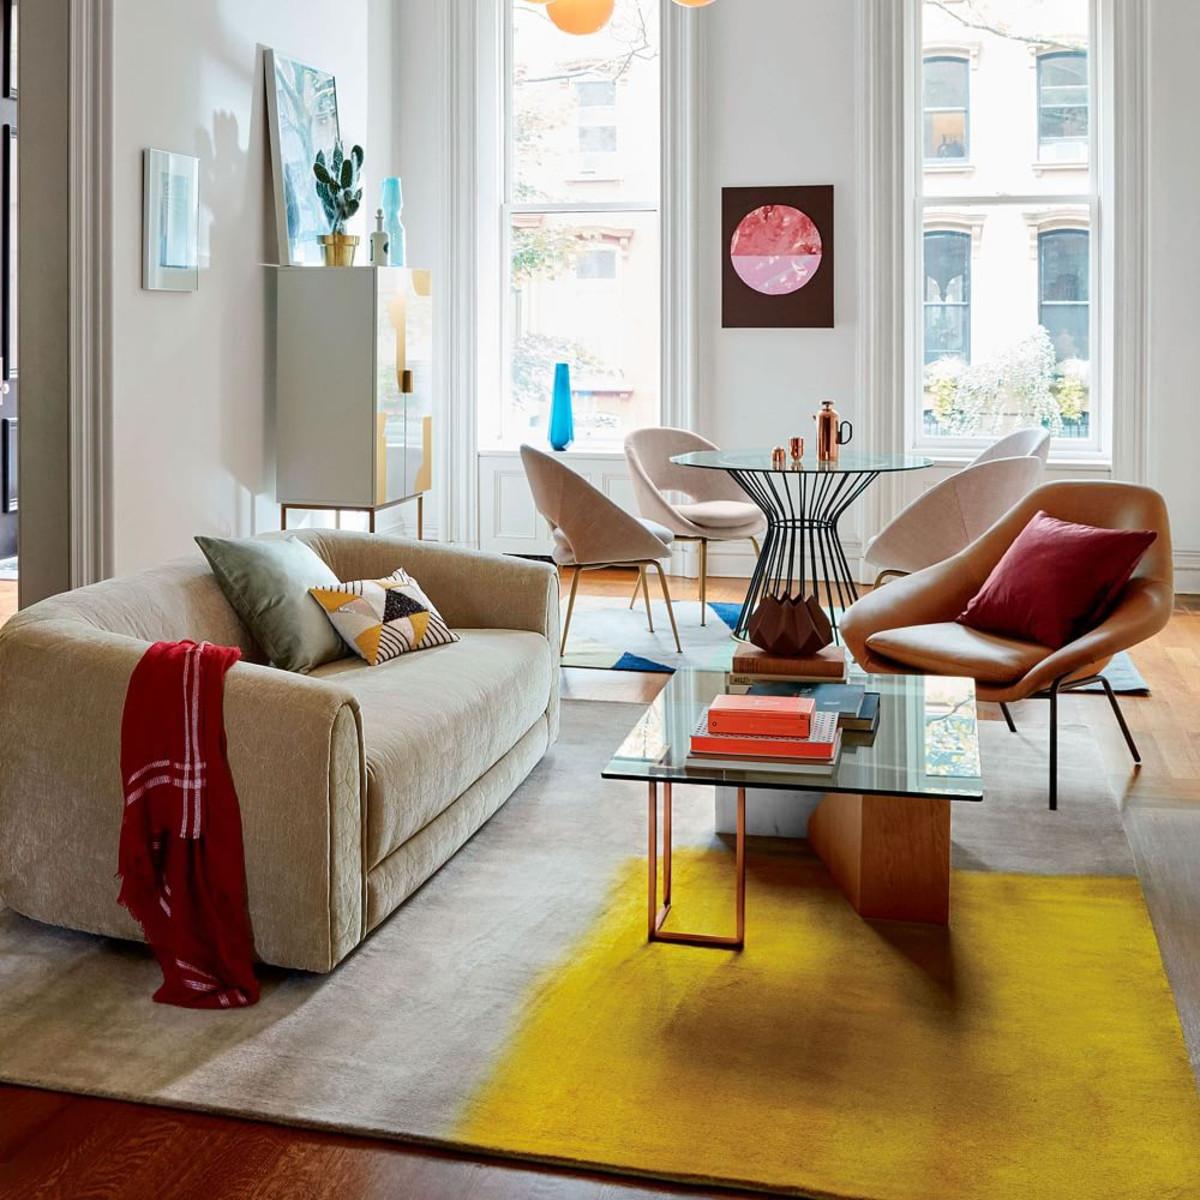 rowan-leather-chair-west-elm-uk.jpg